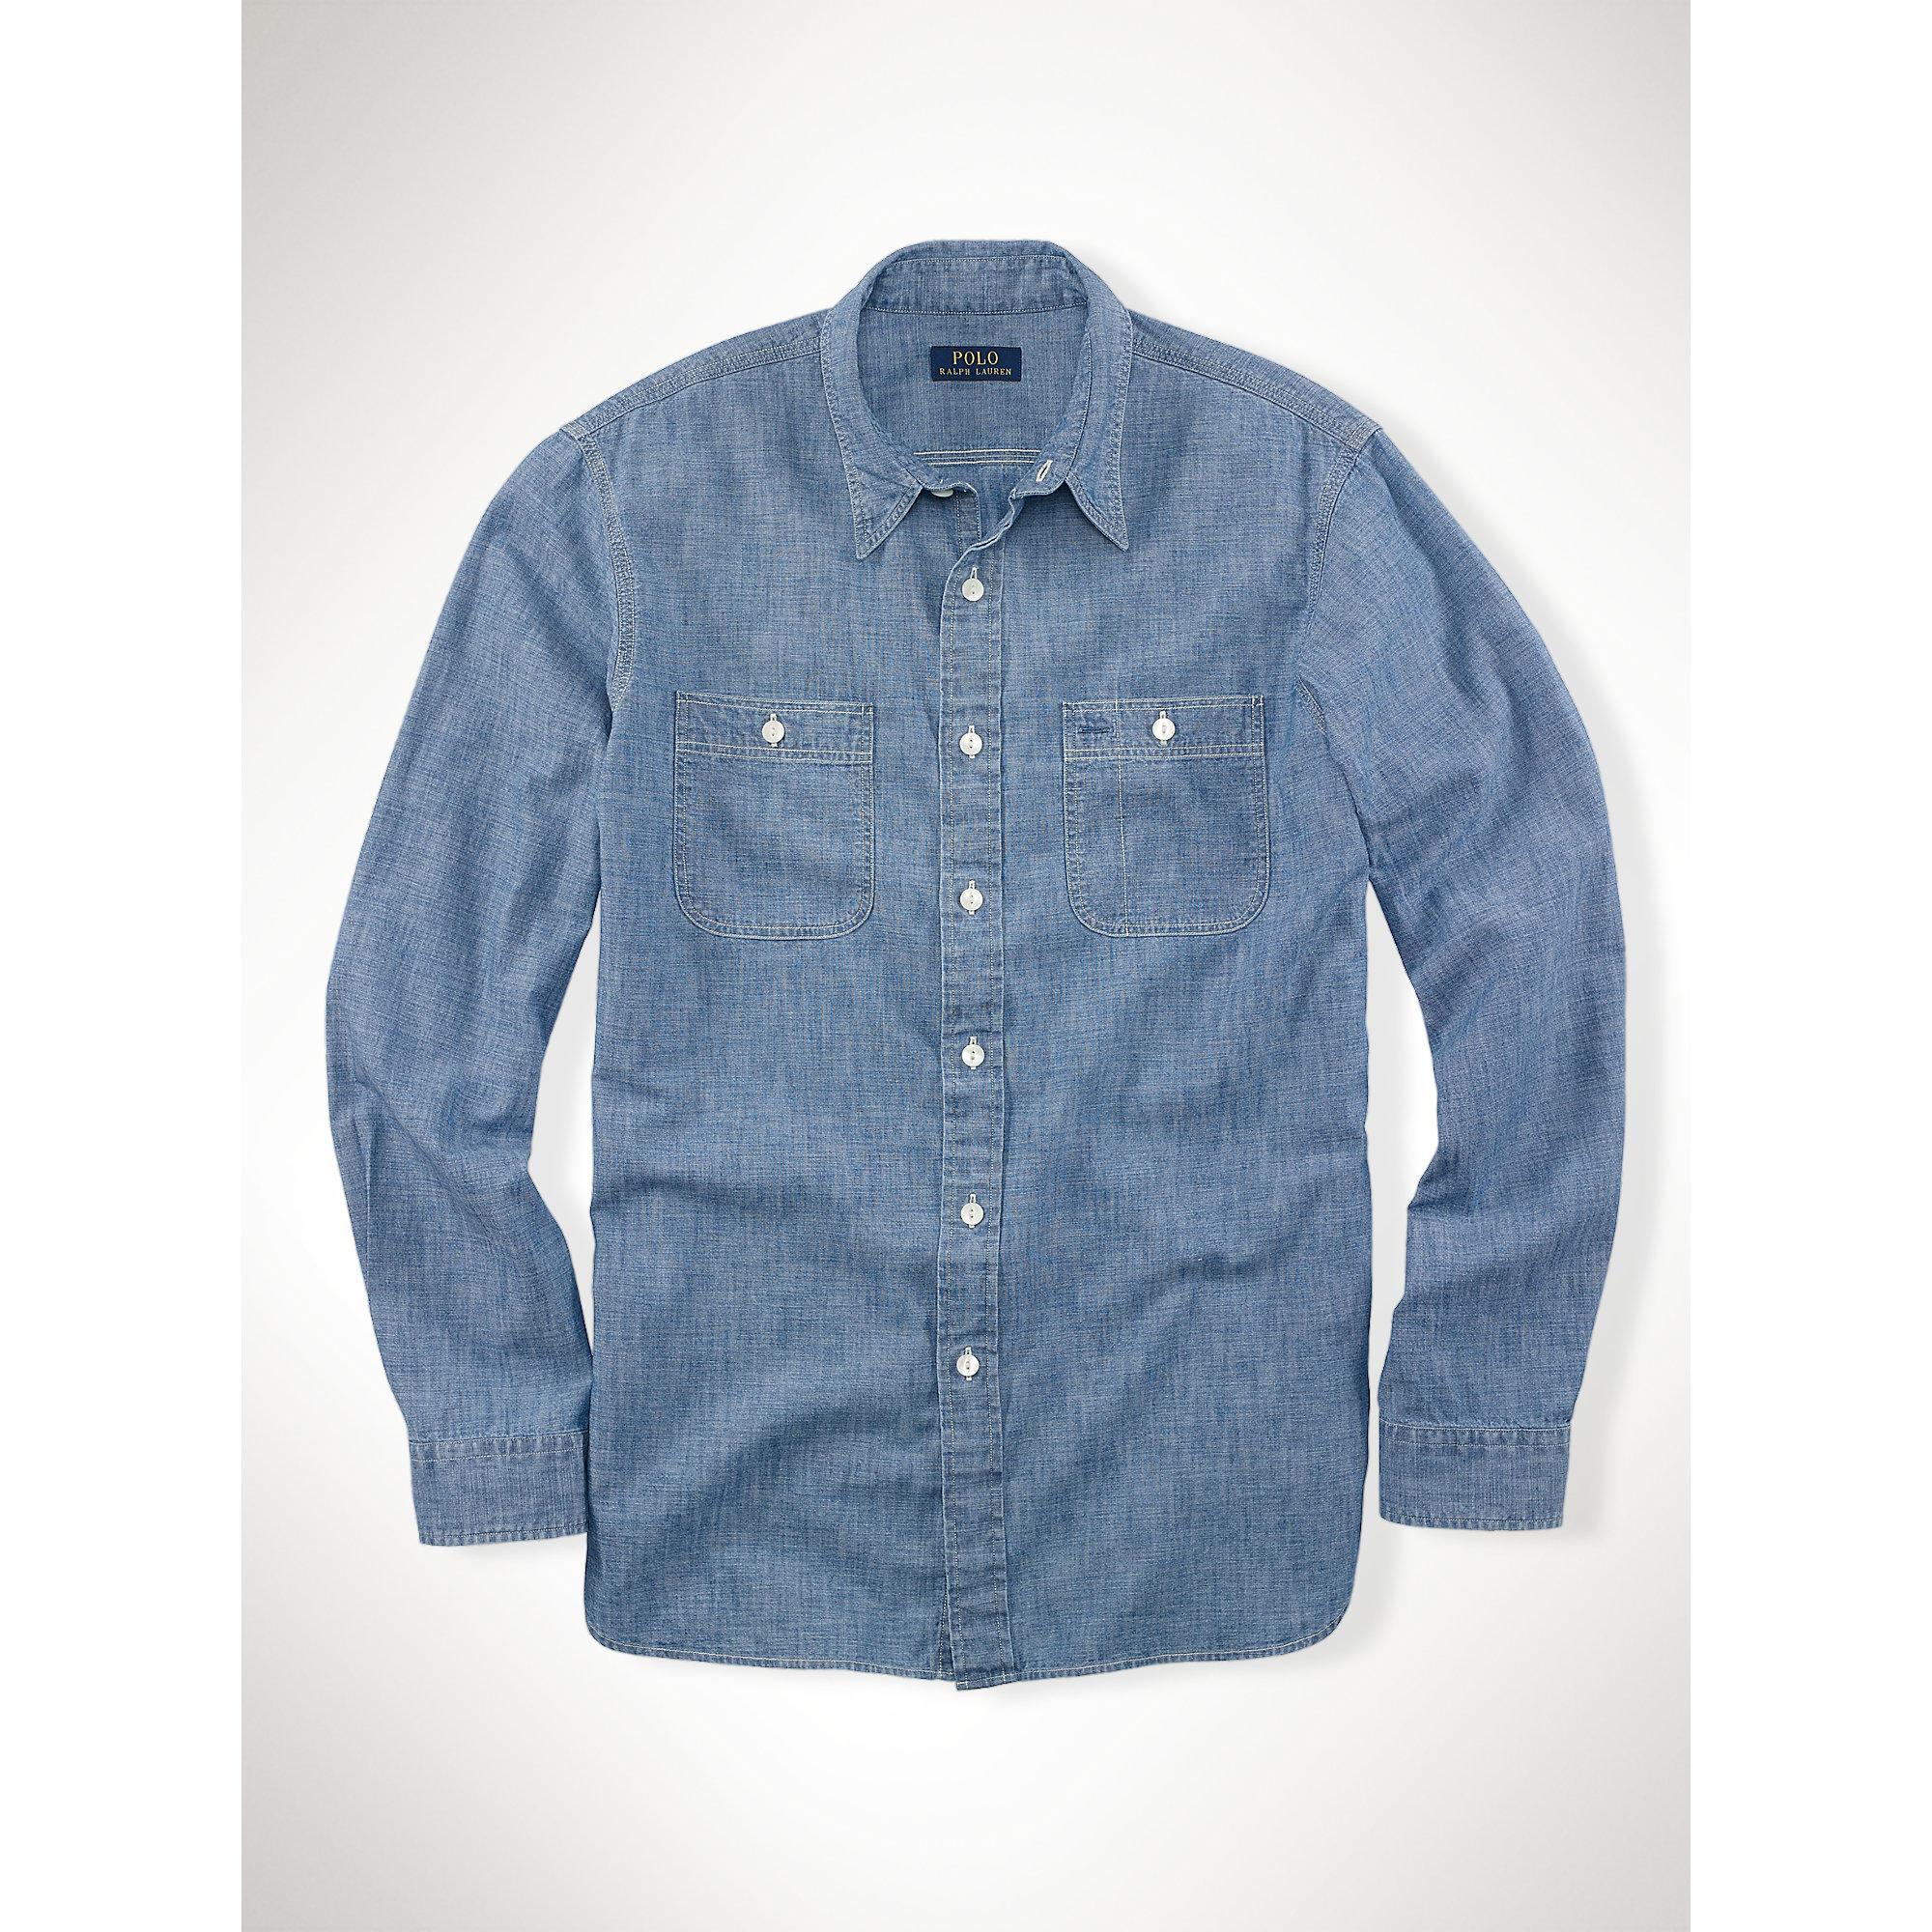 18d65457b Polo Ralph Lauren Cotton Chambray Shirt in Blue for Men - Lyst